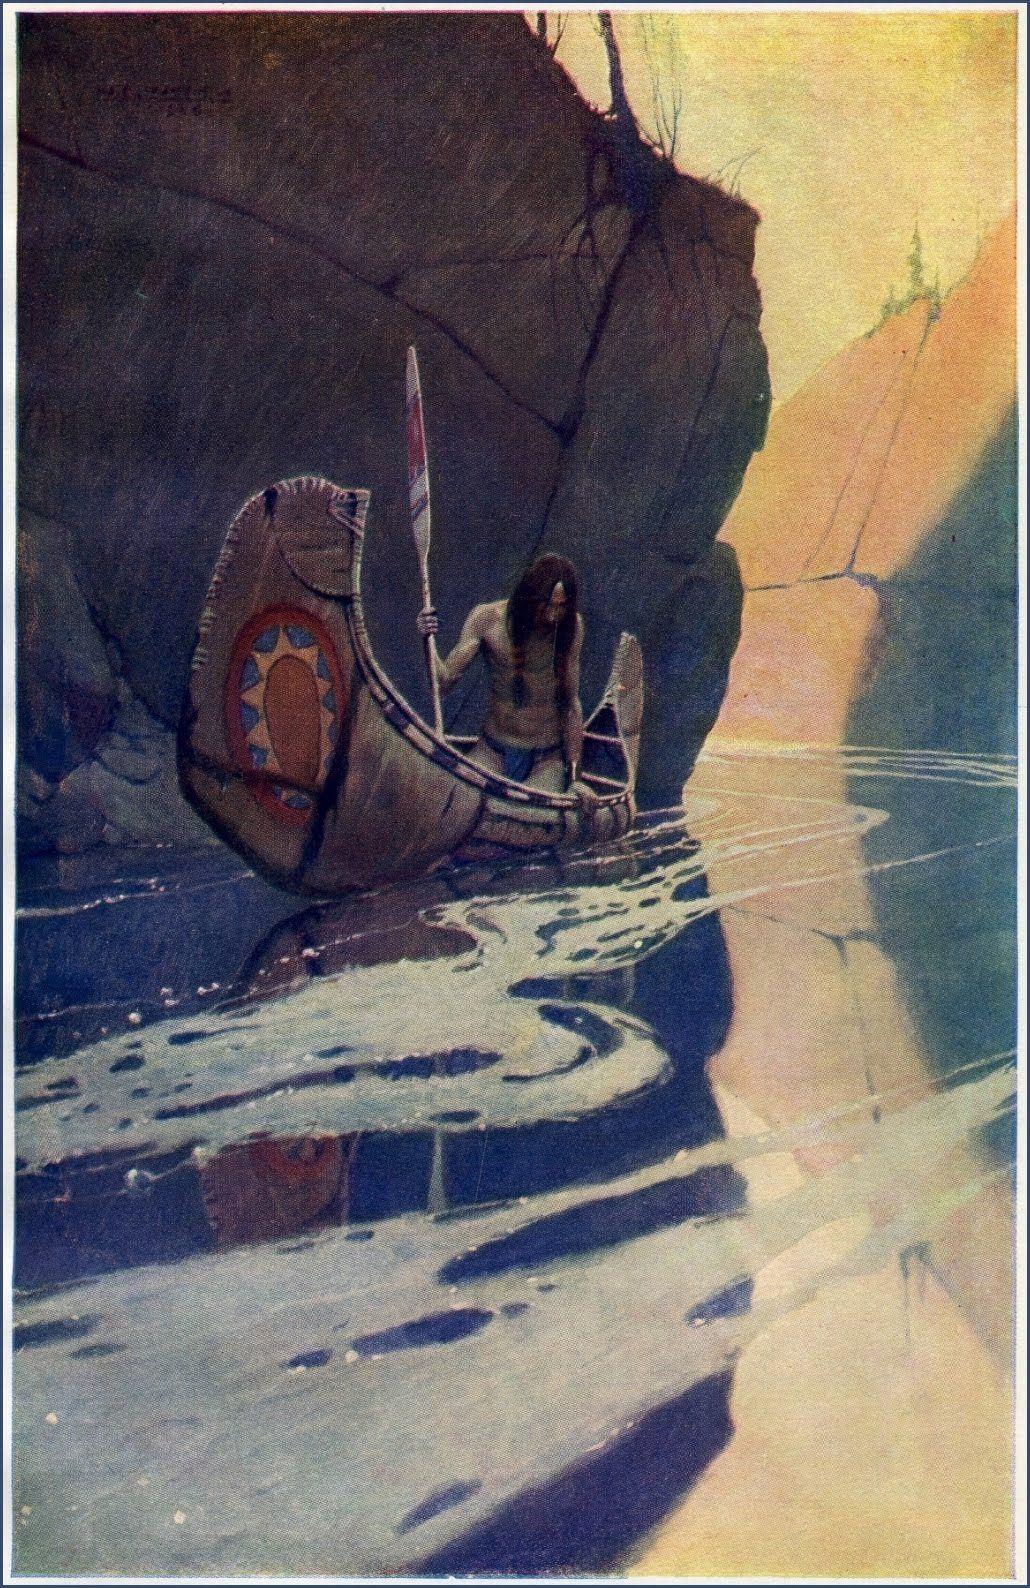 N. C. Wyeth ~ Frank E. Schoonover / CANOES